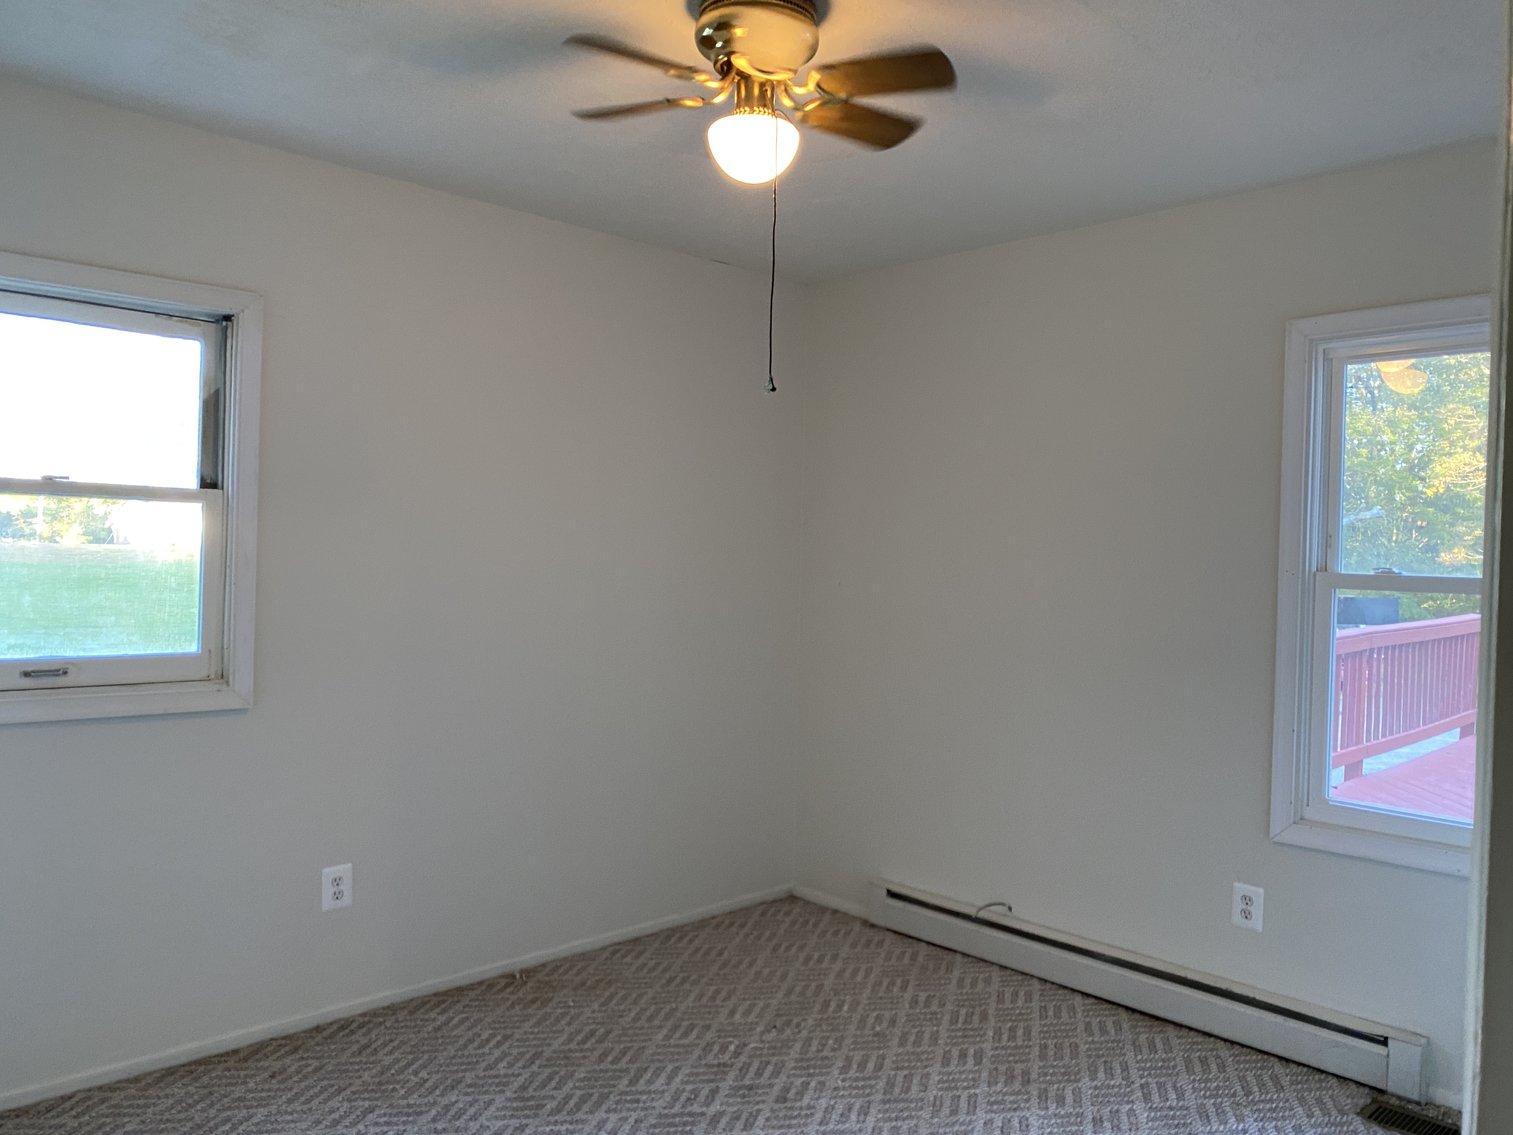 Image for 3 BR/2 BA Home w/1,800+ sf. Shop/Garage on 1 +/- Acre--Orange County, VA